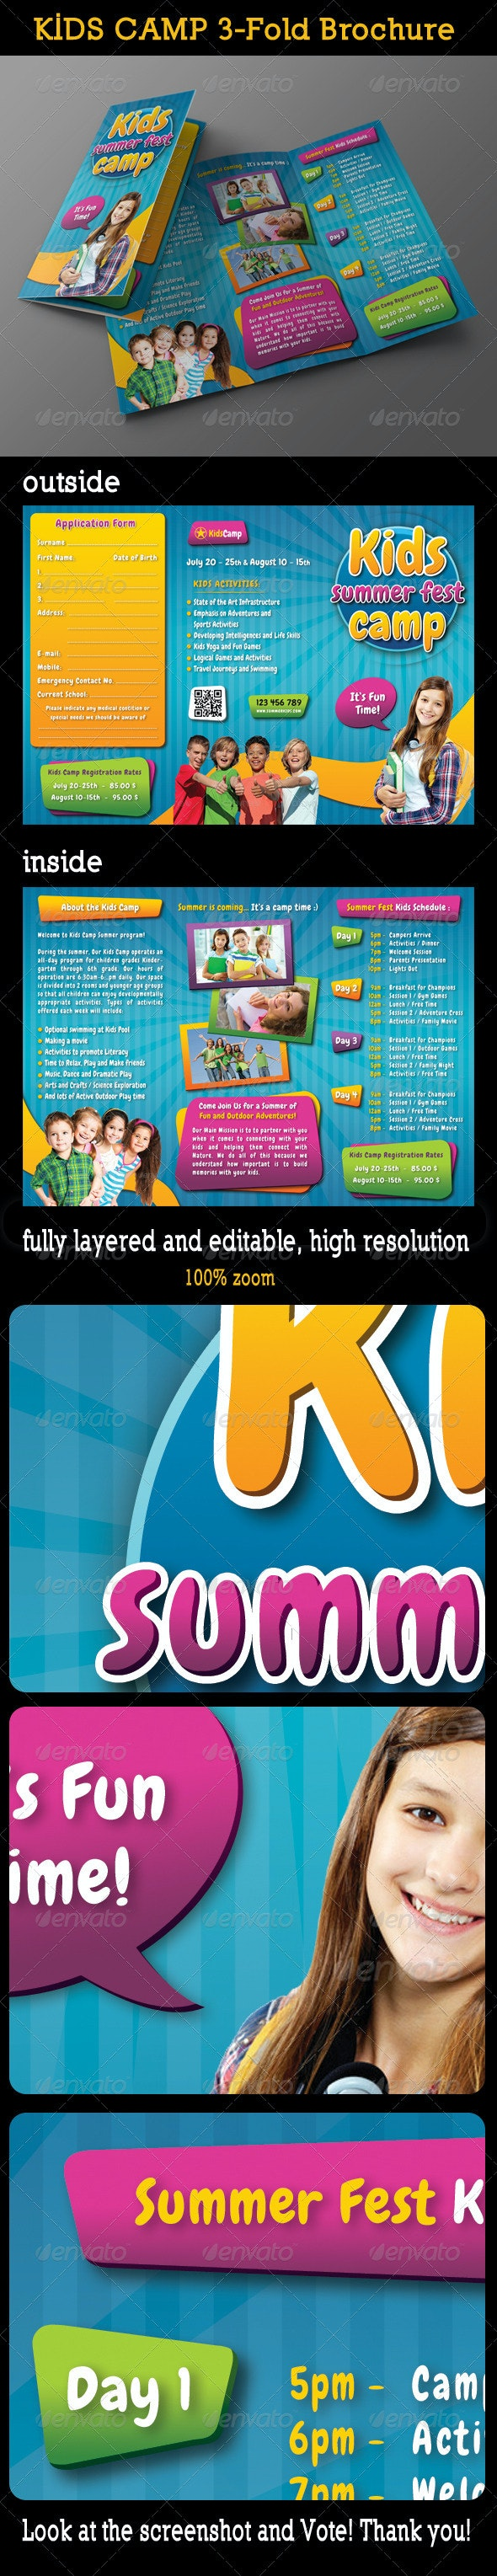 Kids Summer Camp 3-Fold Brochure 01 - Informational Brochures